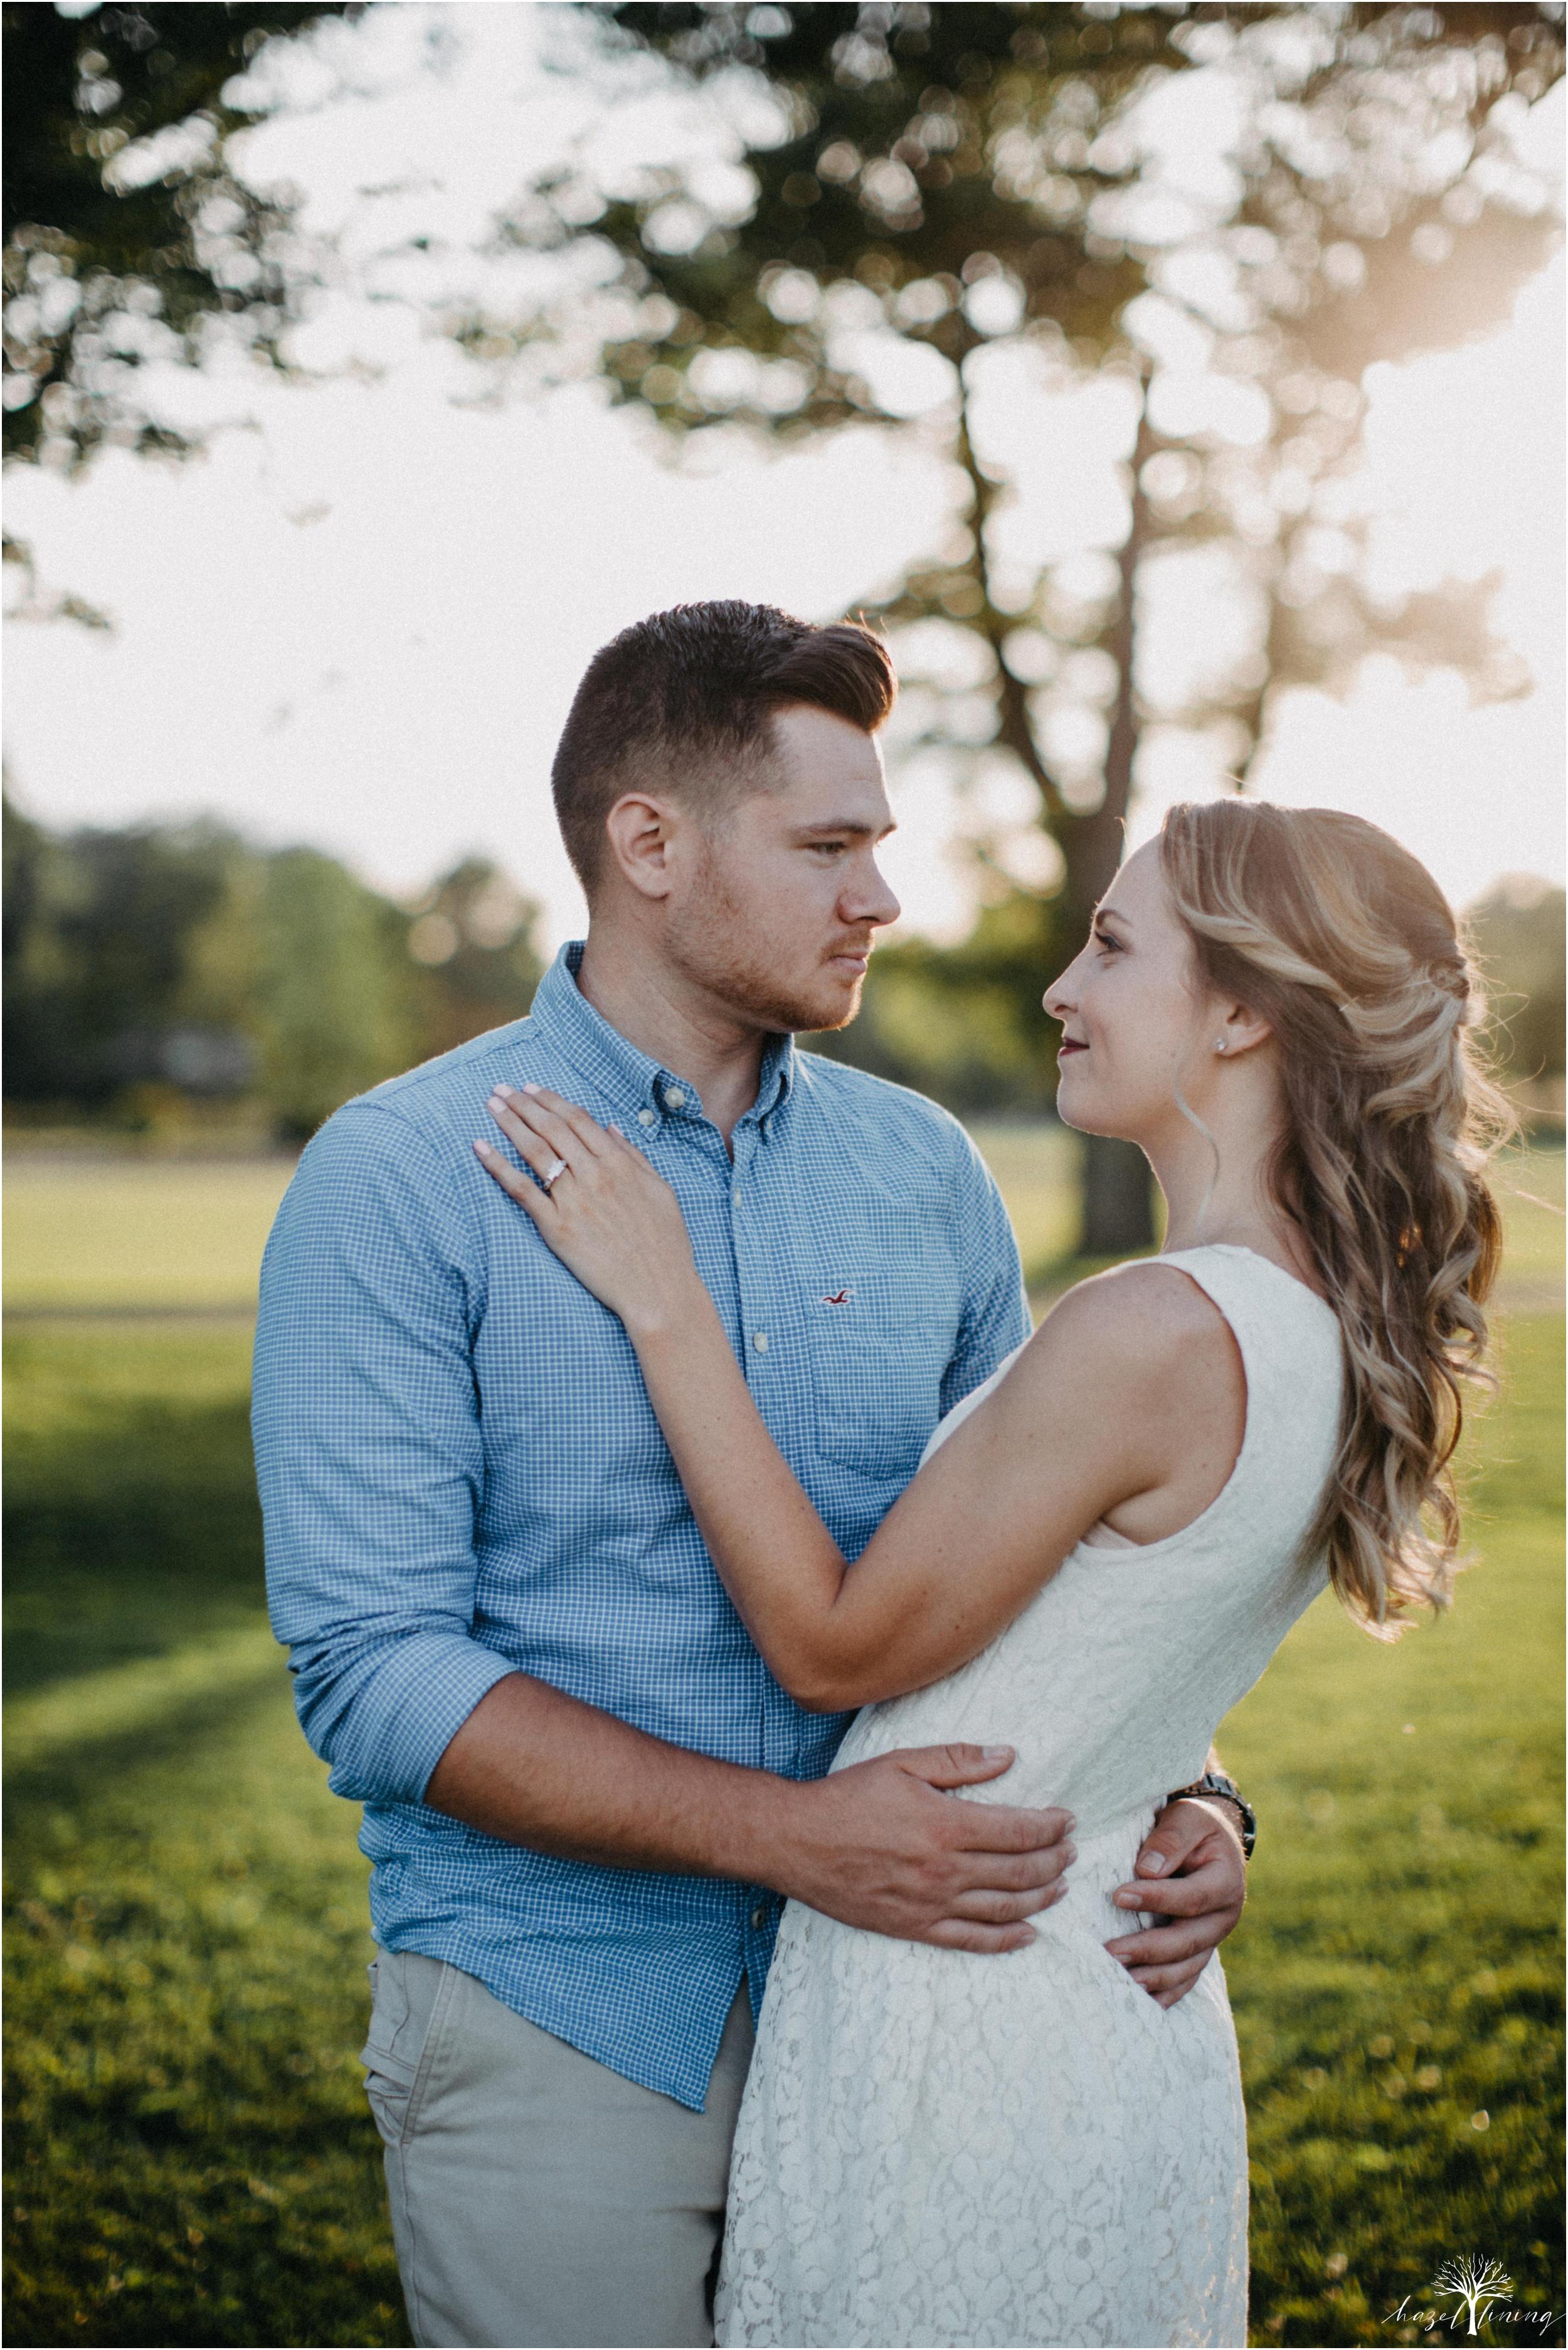 rachel-warner-chris-niedrist-the-farm-bakery-and-events-quakertown-pa-summer-engagement-hazel-lining-photography-destination-elopement-wedding-engagement-photography_0023.jpg